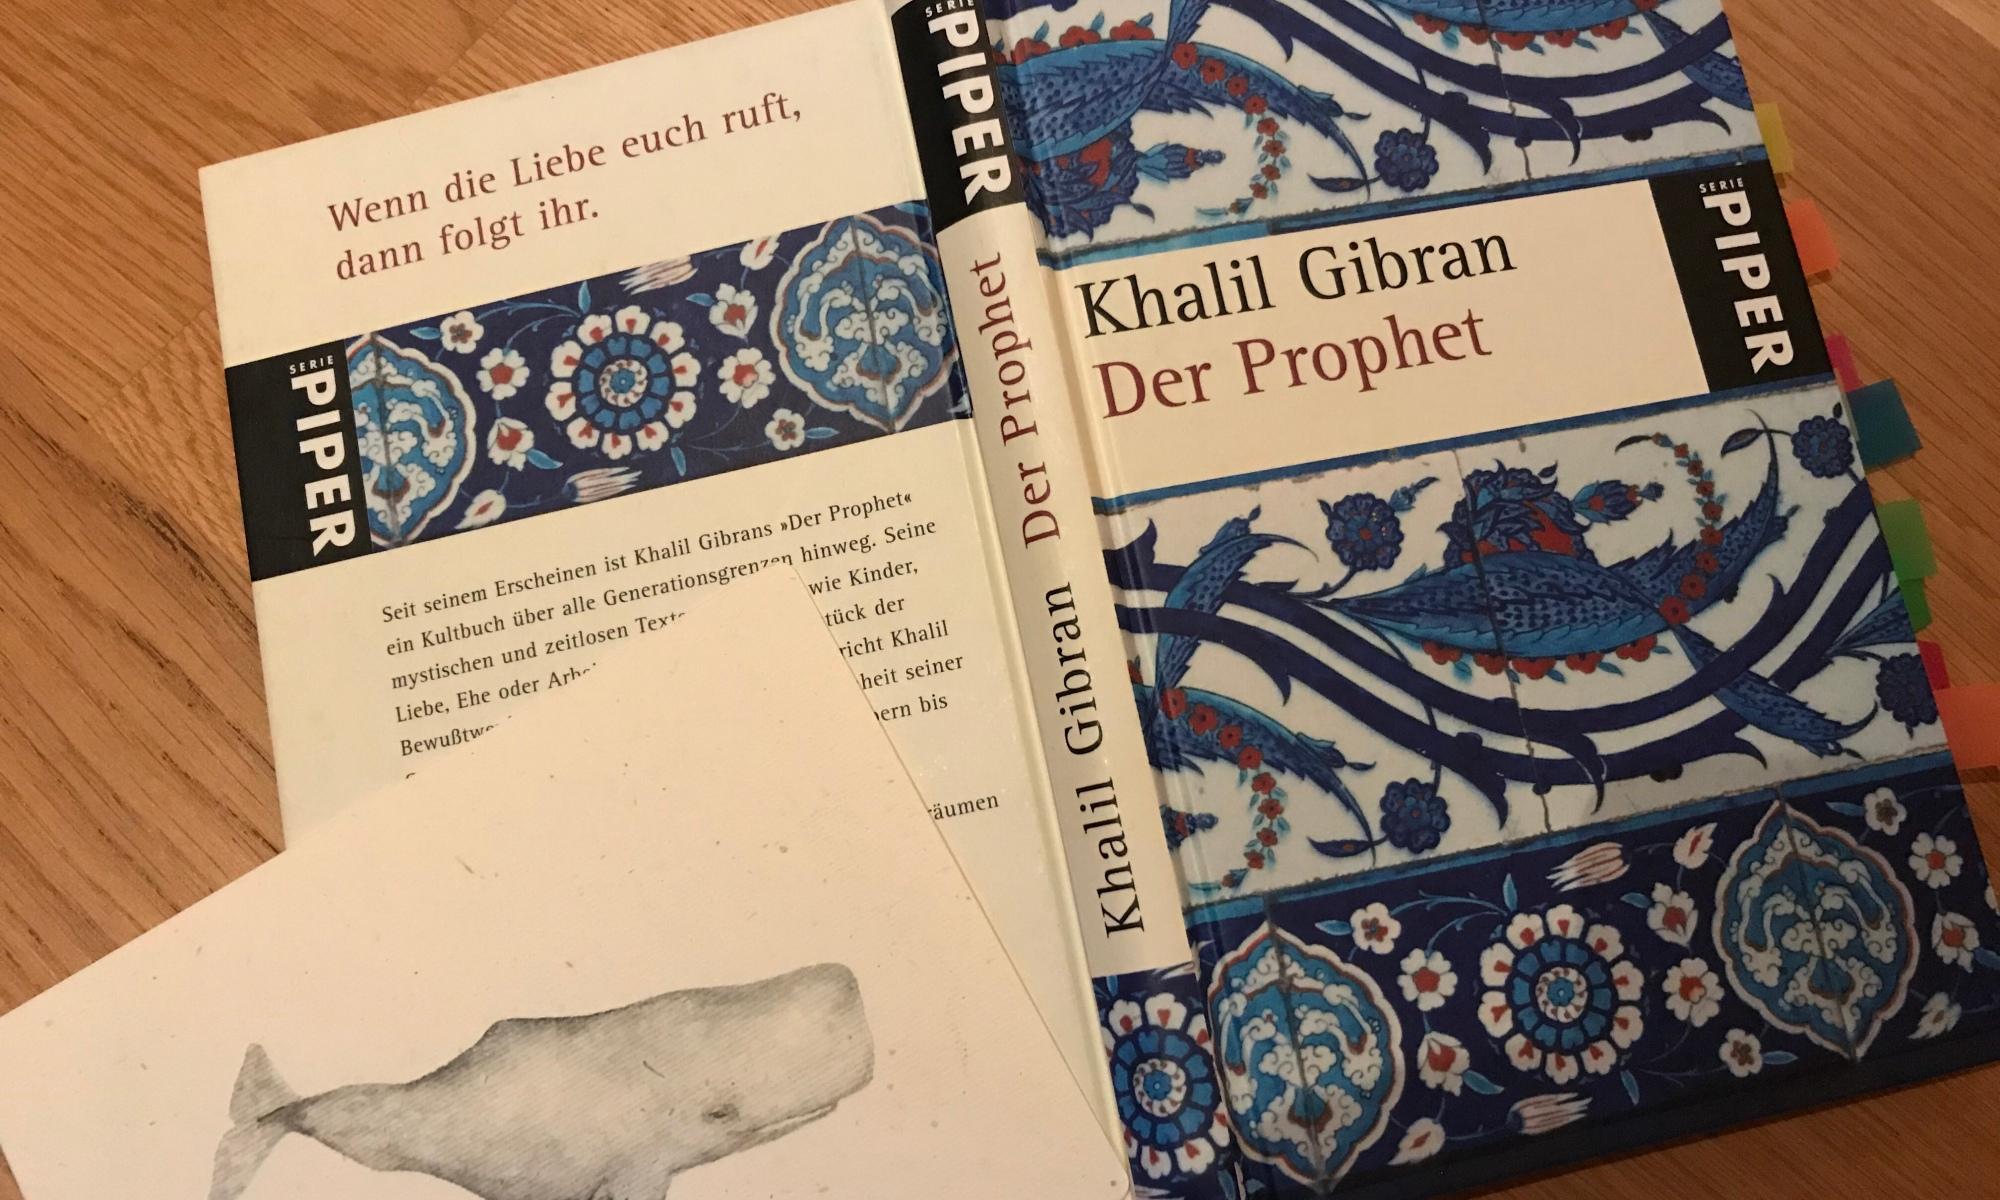 Khalil Gibrans Prophet